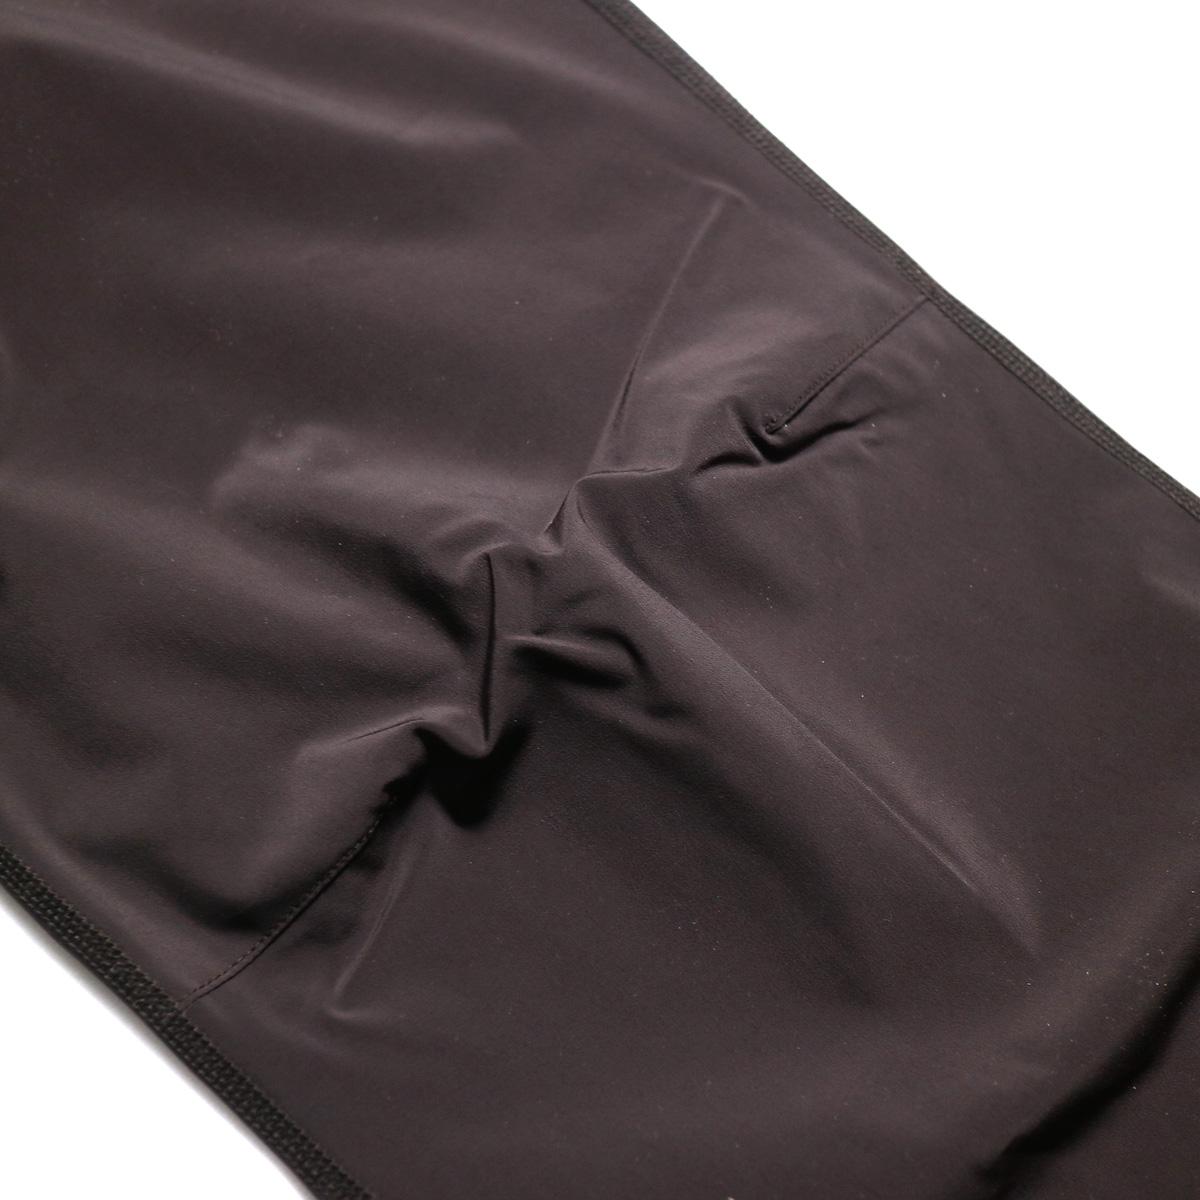 SOUTH2 WEST8 / 1P Cycle Pant-N/Pu Taffeta (Brown) 膝